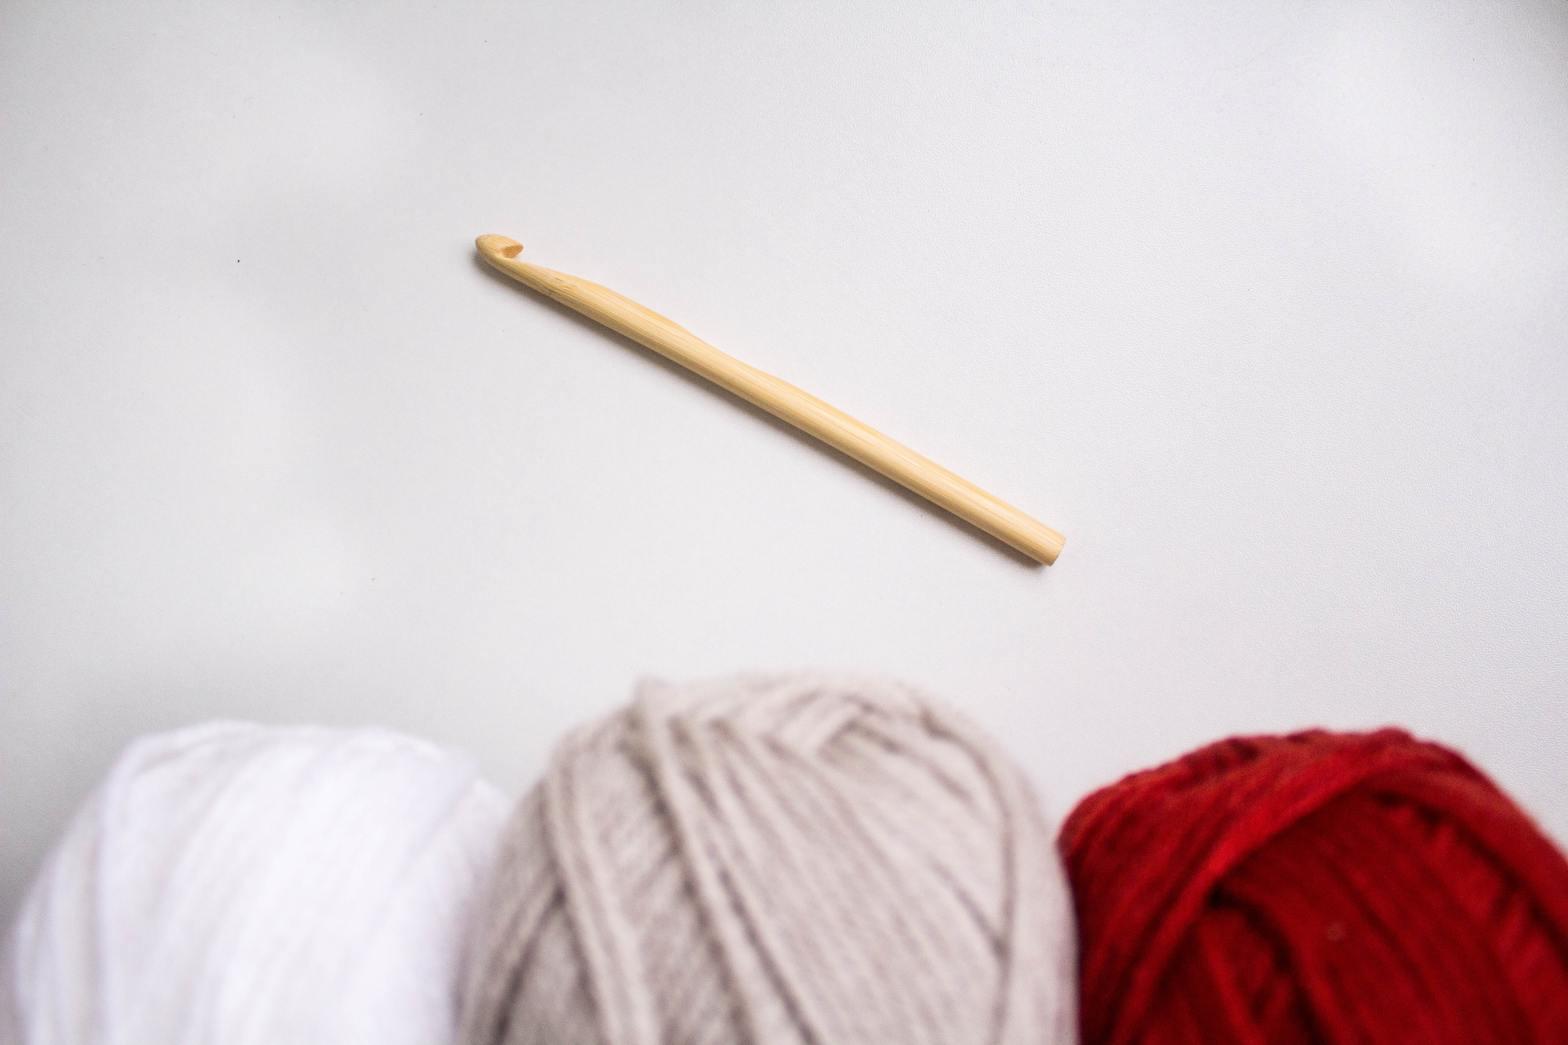 étirements crochet